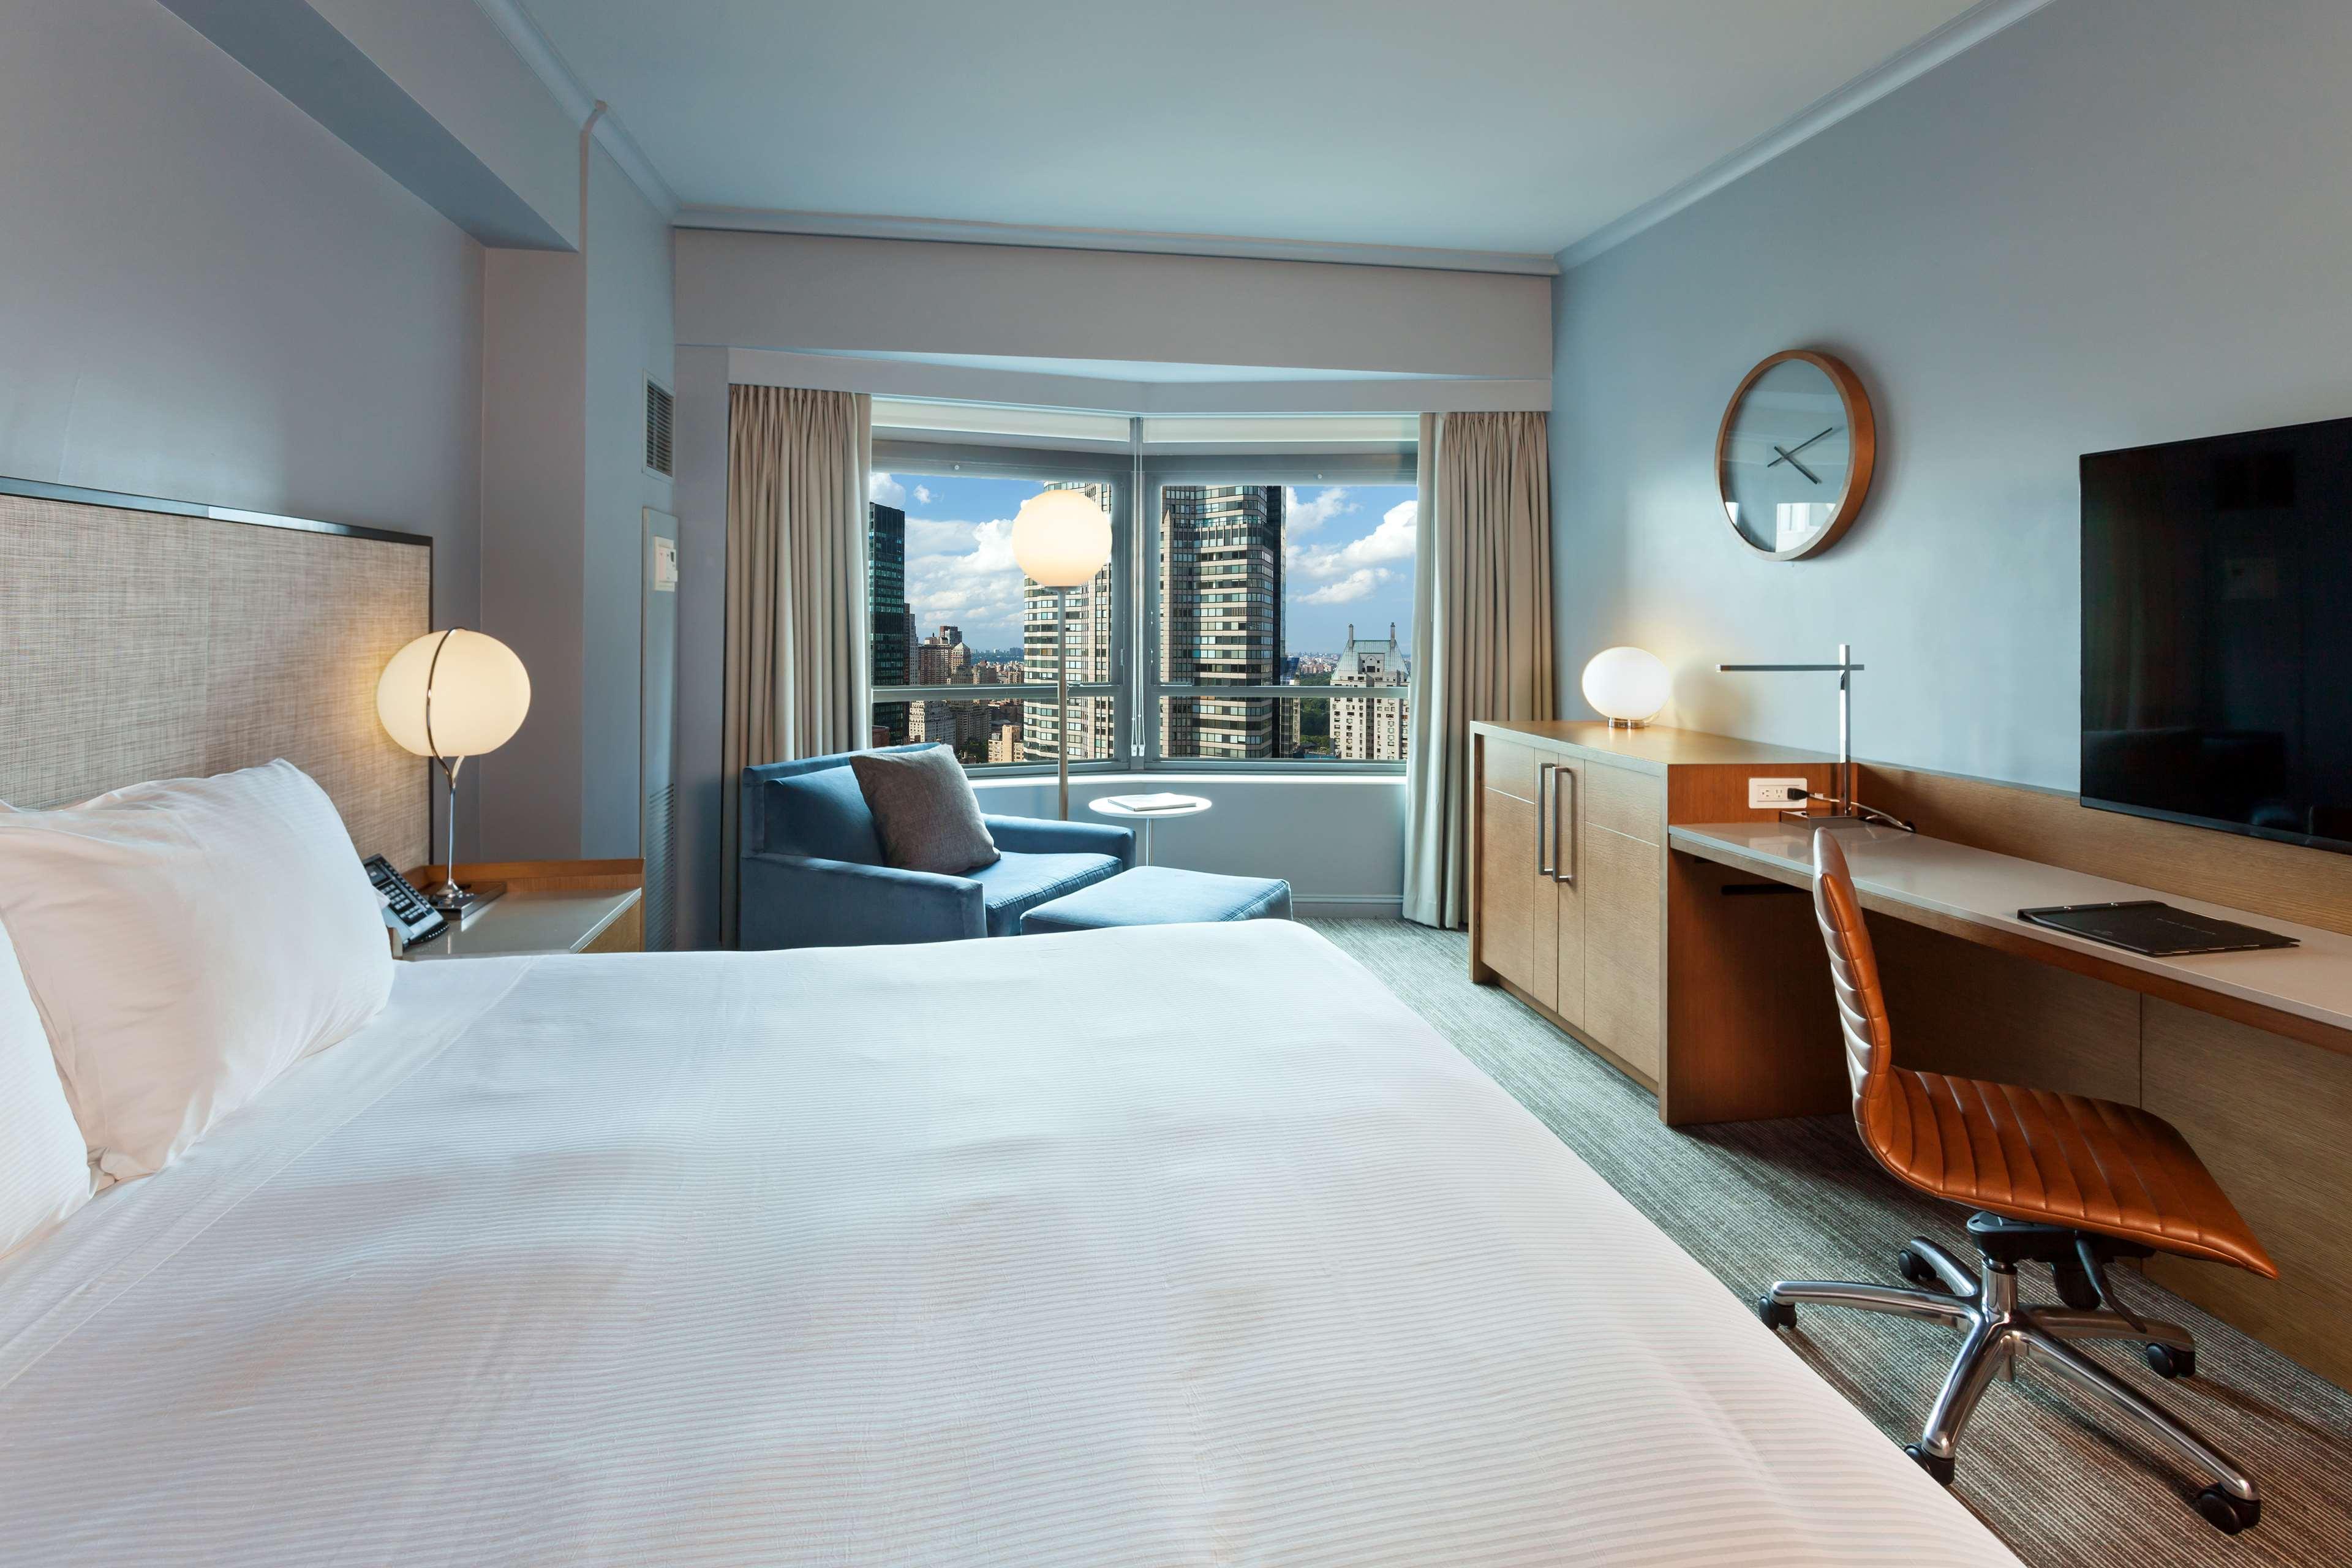 New York Hilton Midtown image 43